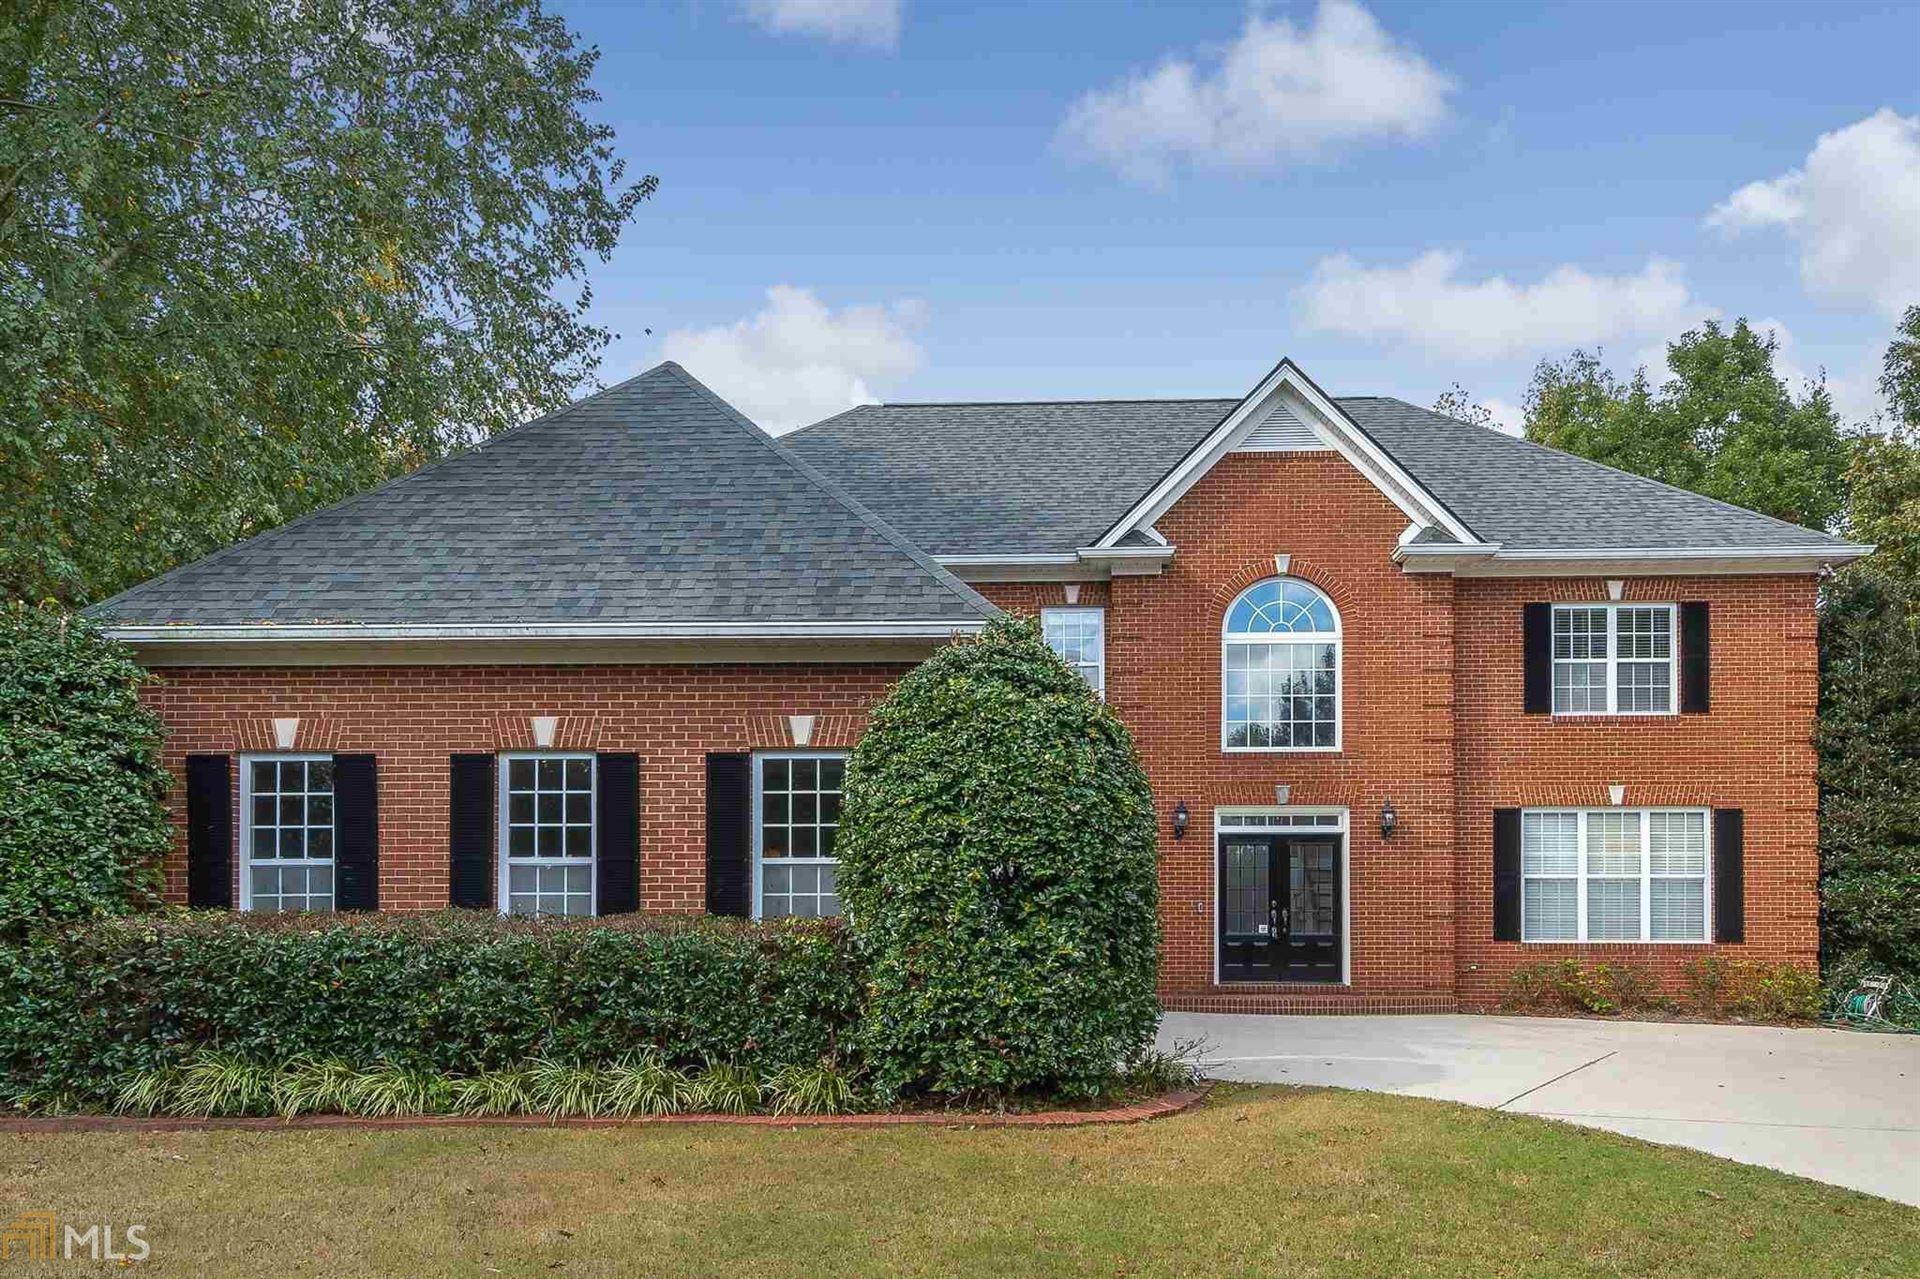 2121 Imperial Dr, Gainesville, GA 30501 - MLS#: 8880558